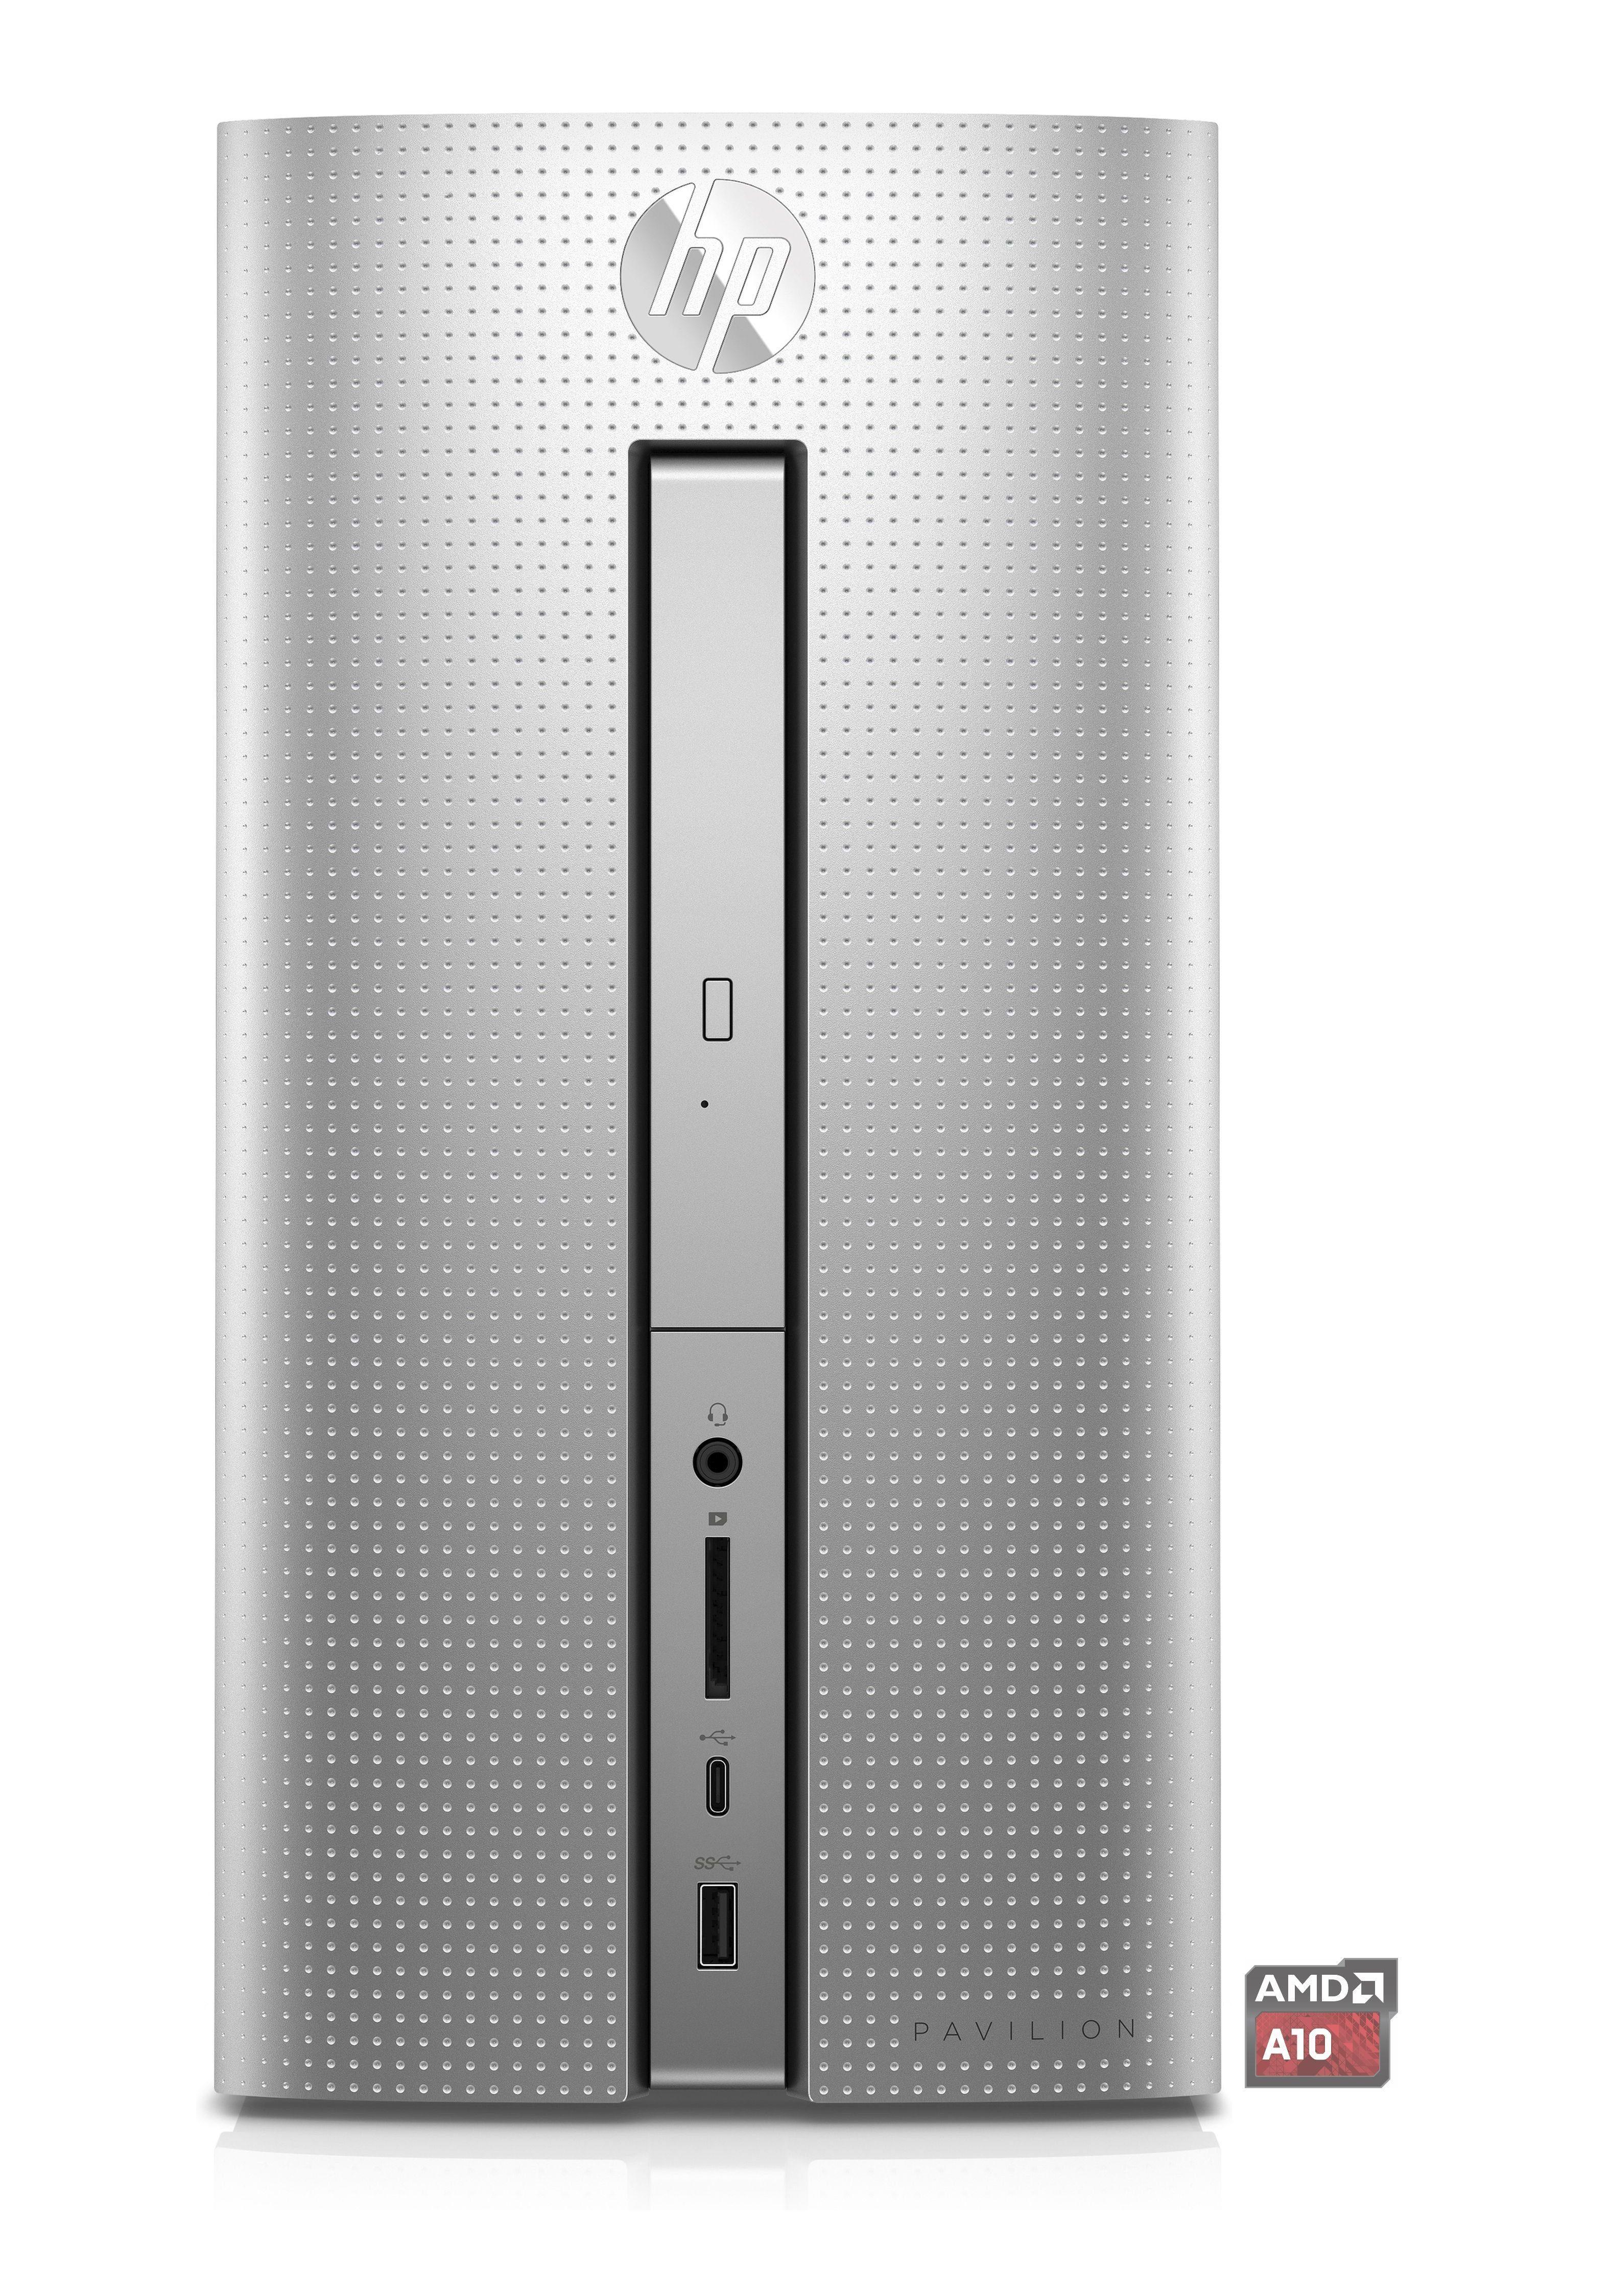 HP Pavilion Desktop 570-p060ng »Quad Core A10-9700, R7, 128 GB + 1 TB HHD, 8 GB«